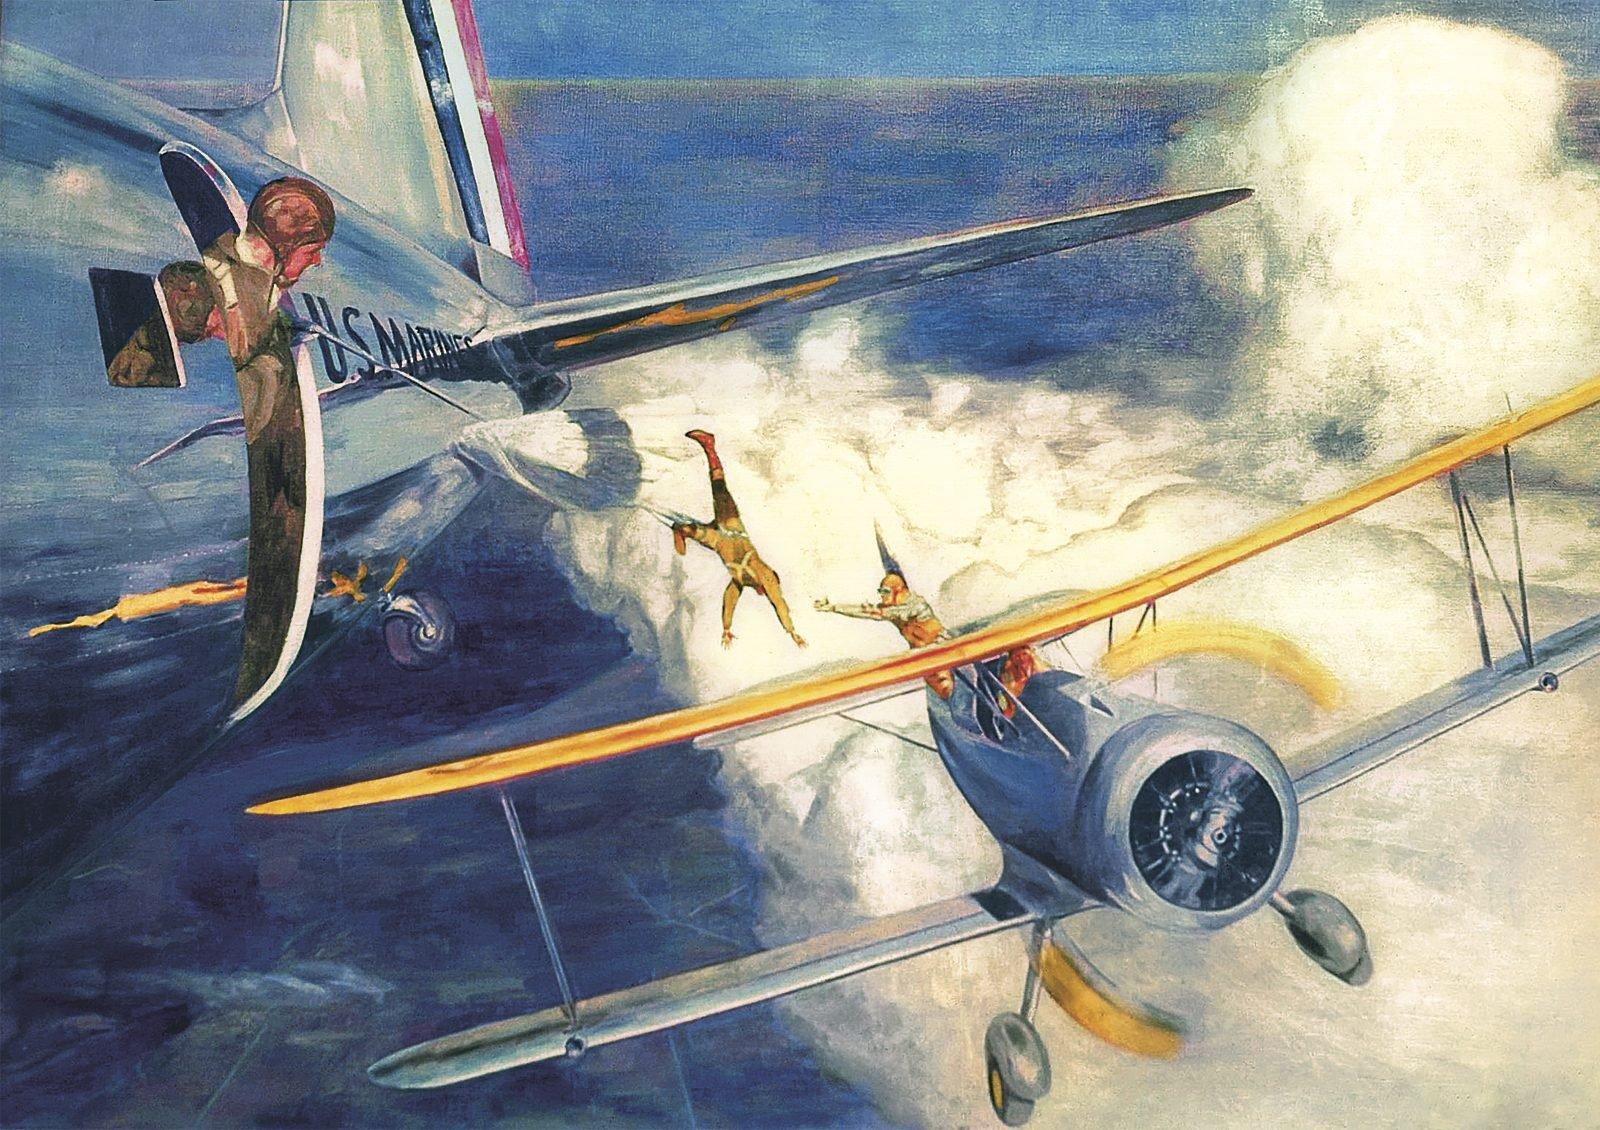 Mid-air rescue